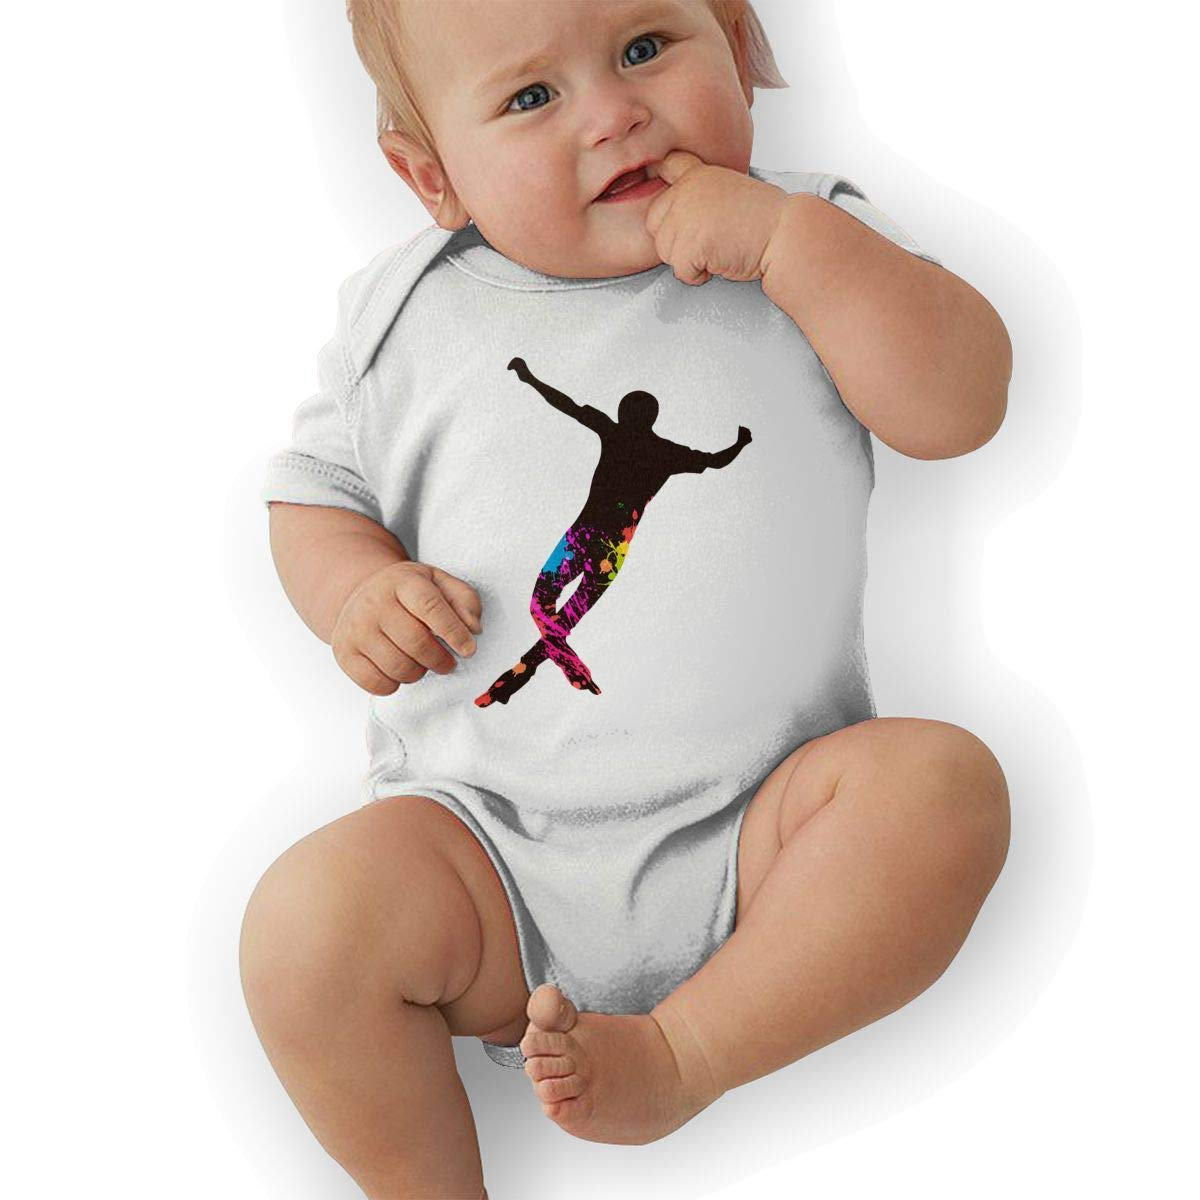 21kingeh Toddler Baby Boys Bodysuit Short-Sleeve Onesie Roller Skating Dance Boy Print Jumpsuit Autumn Pajamas